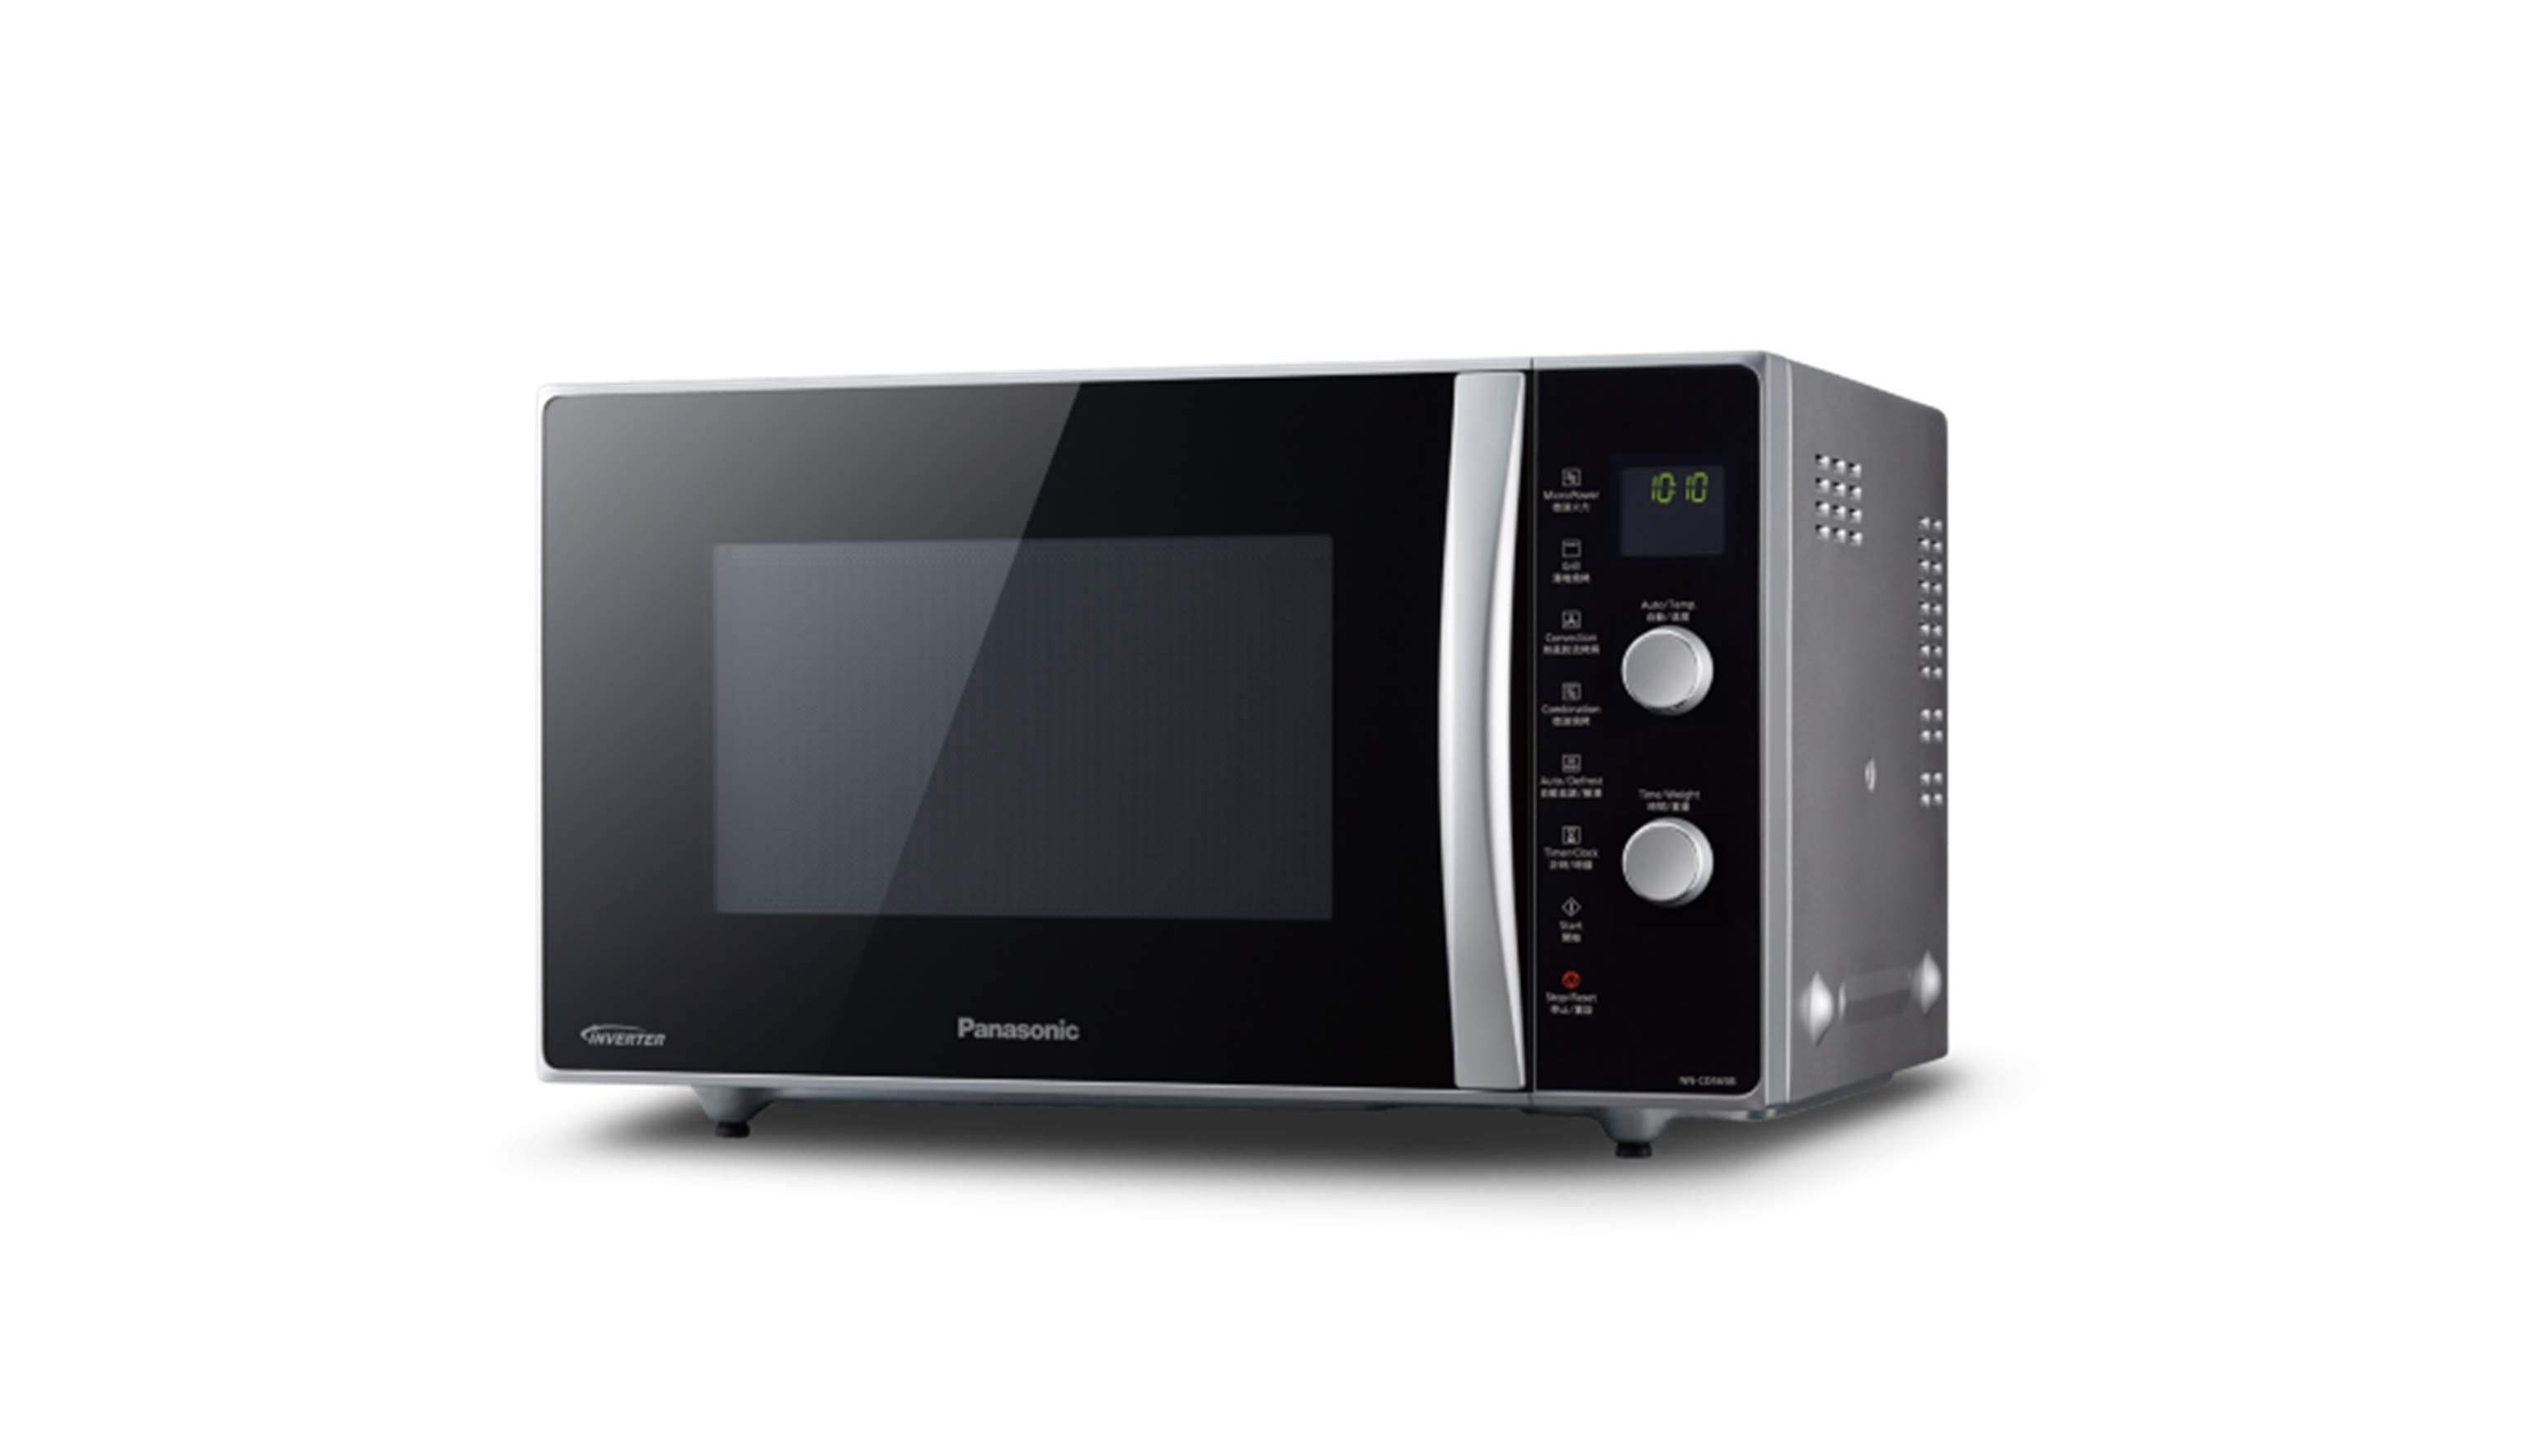 Panasonic 27L NN-CD565B Microwave Oven-Side View